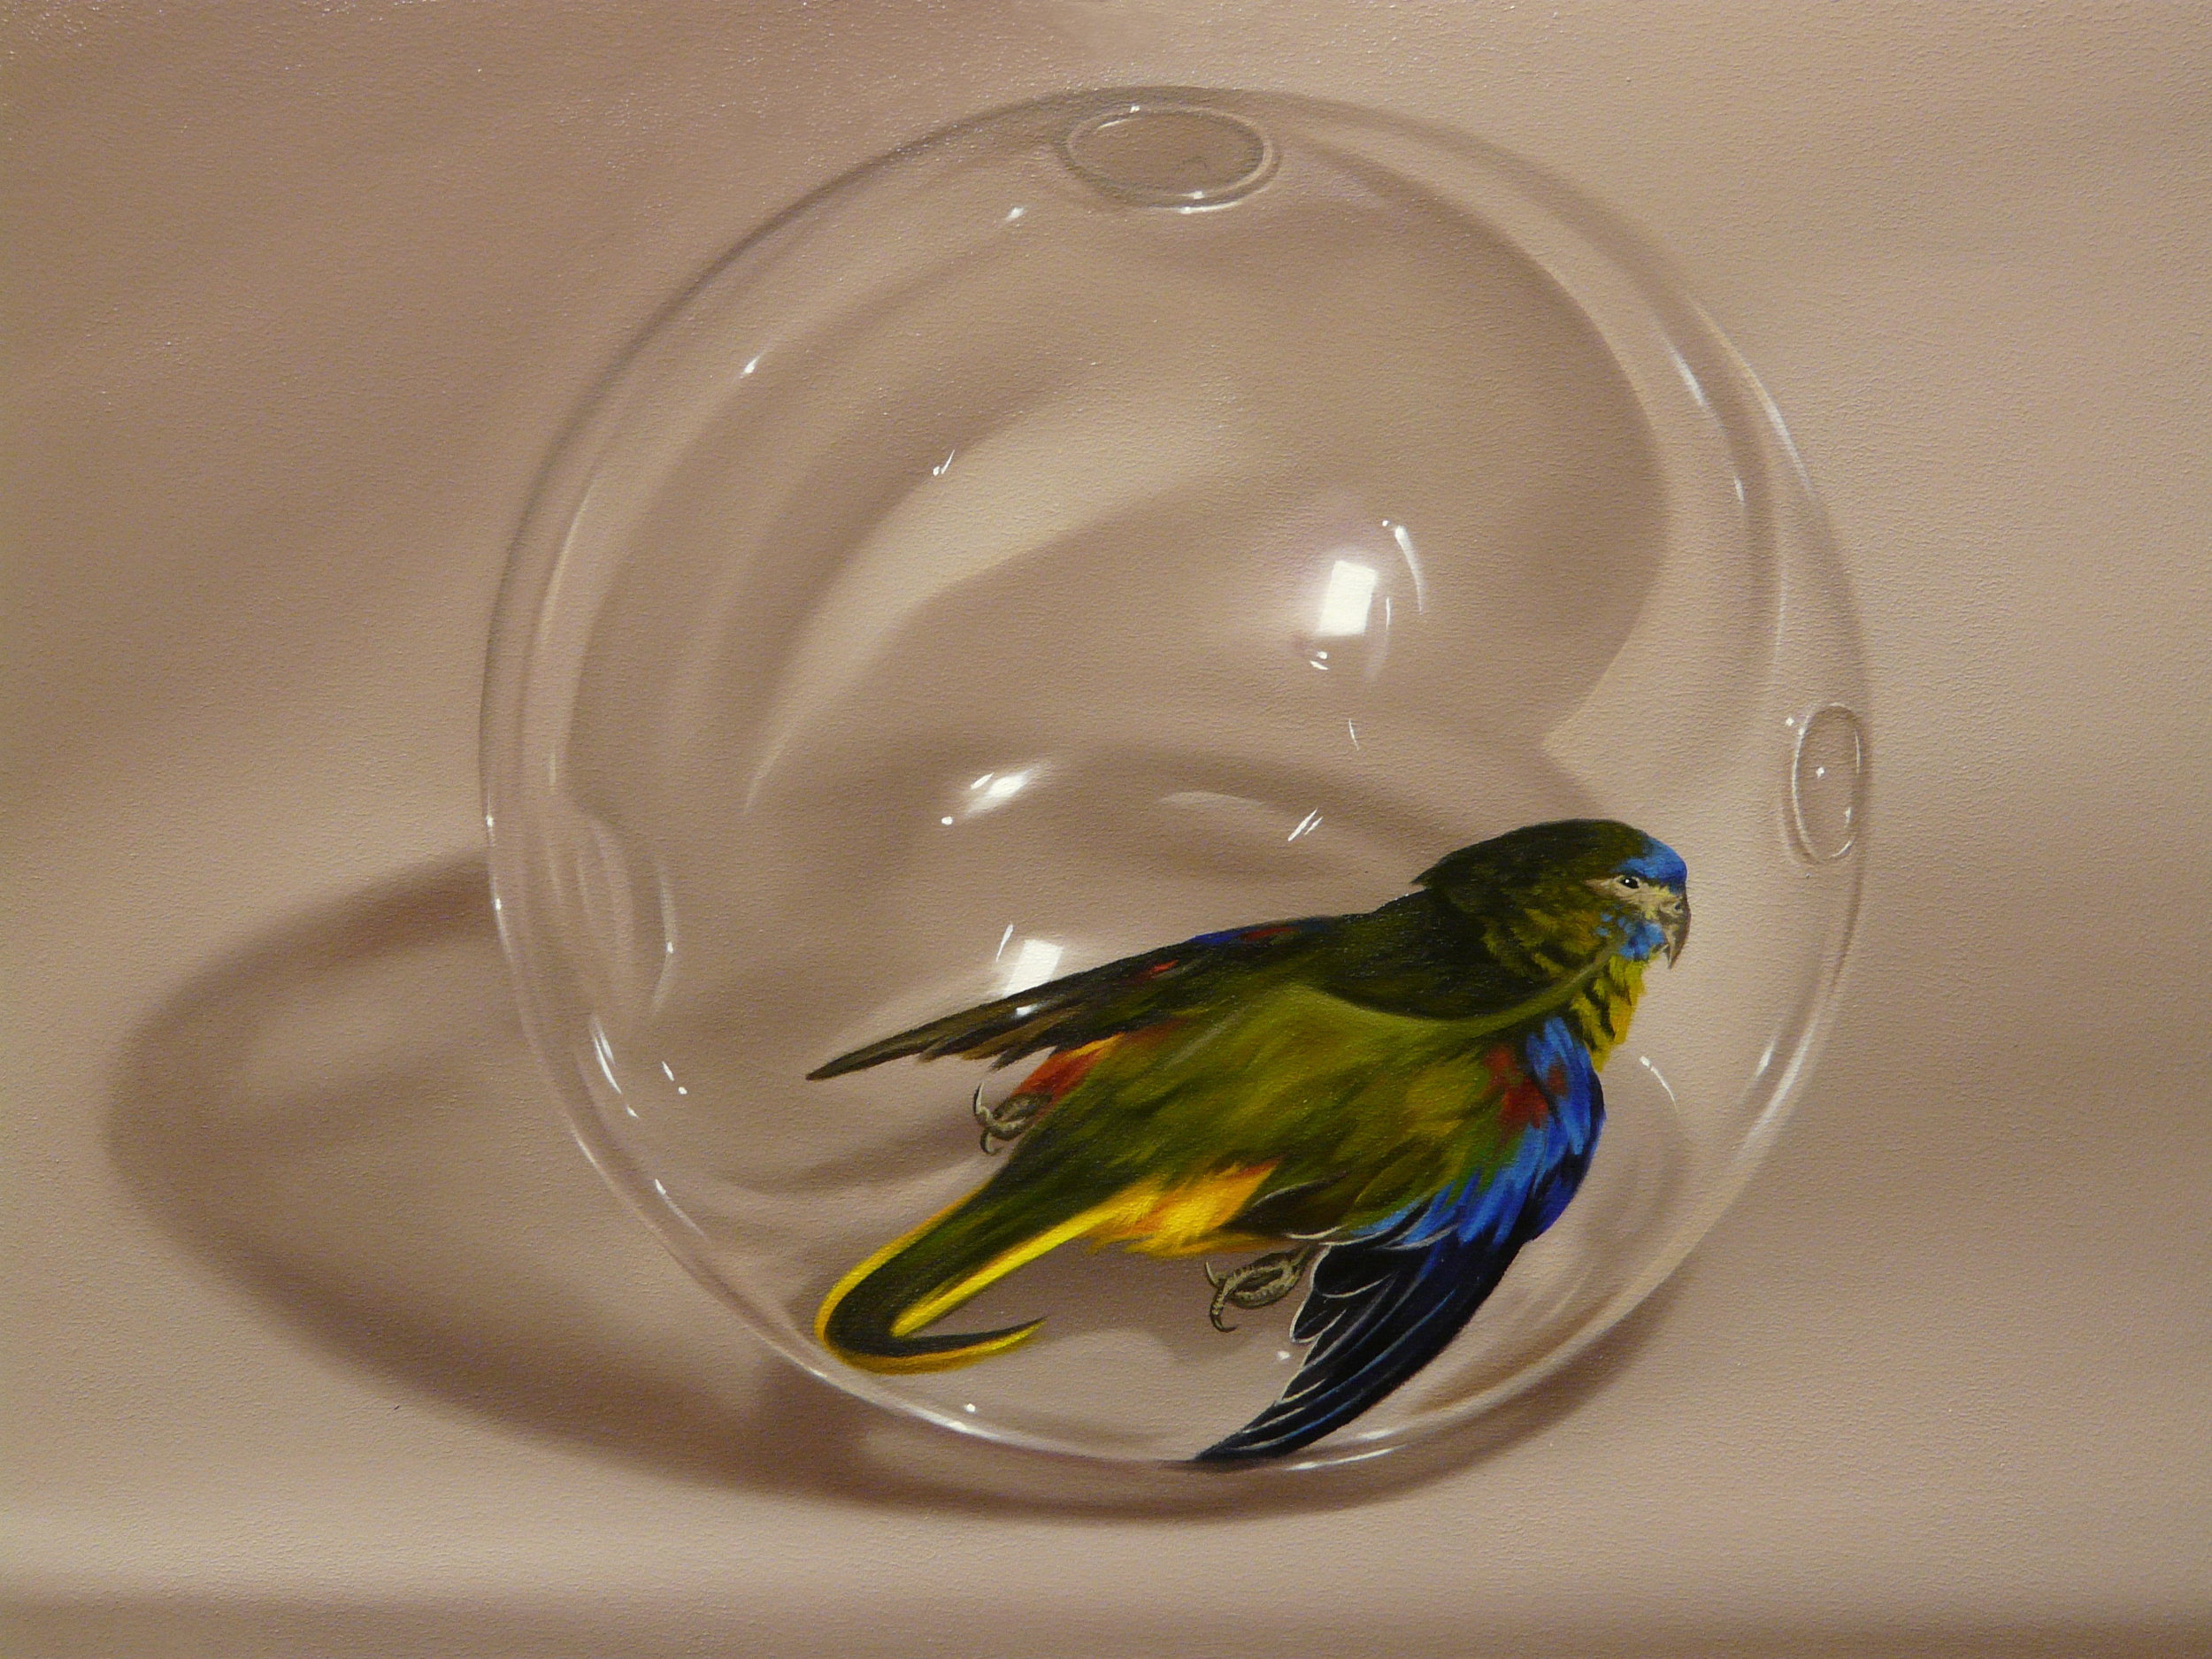 Parakeet in glass